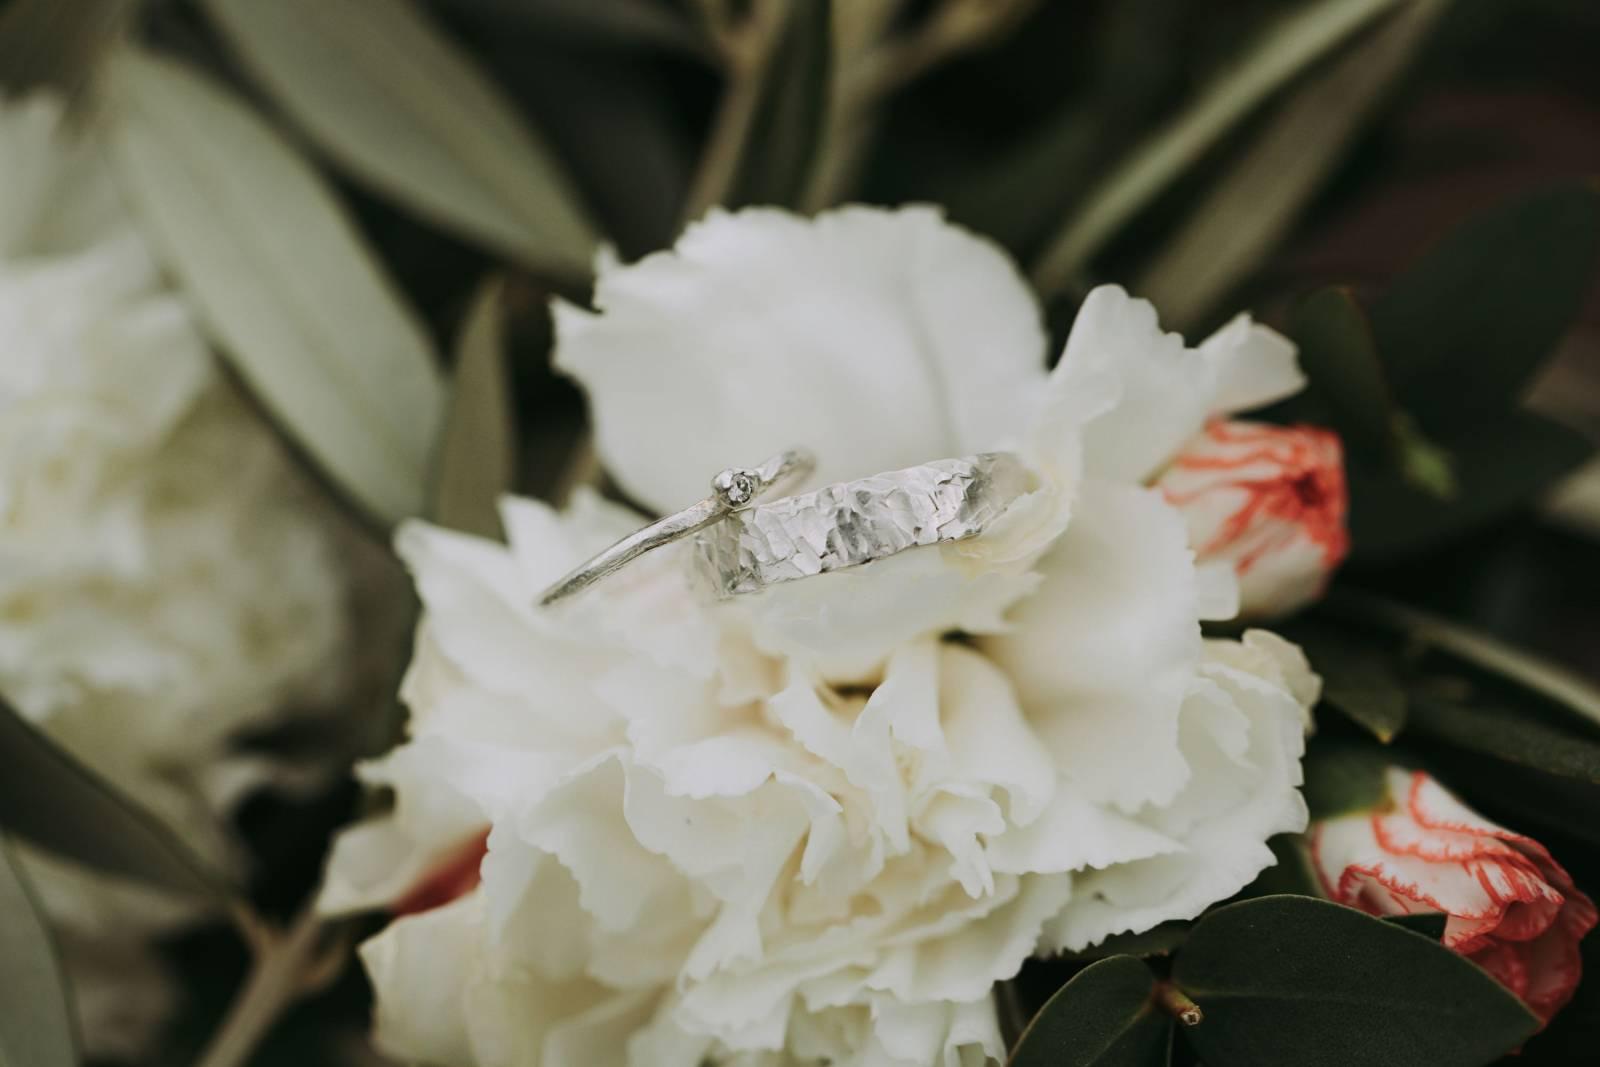 Nathalie Swinnen - Juwelen - Bruidsjuwelen - Verlovingsring - Trouwring - House of Weddings - 37